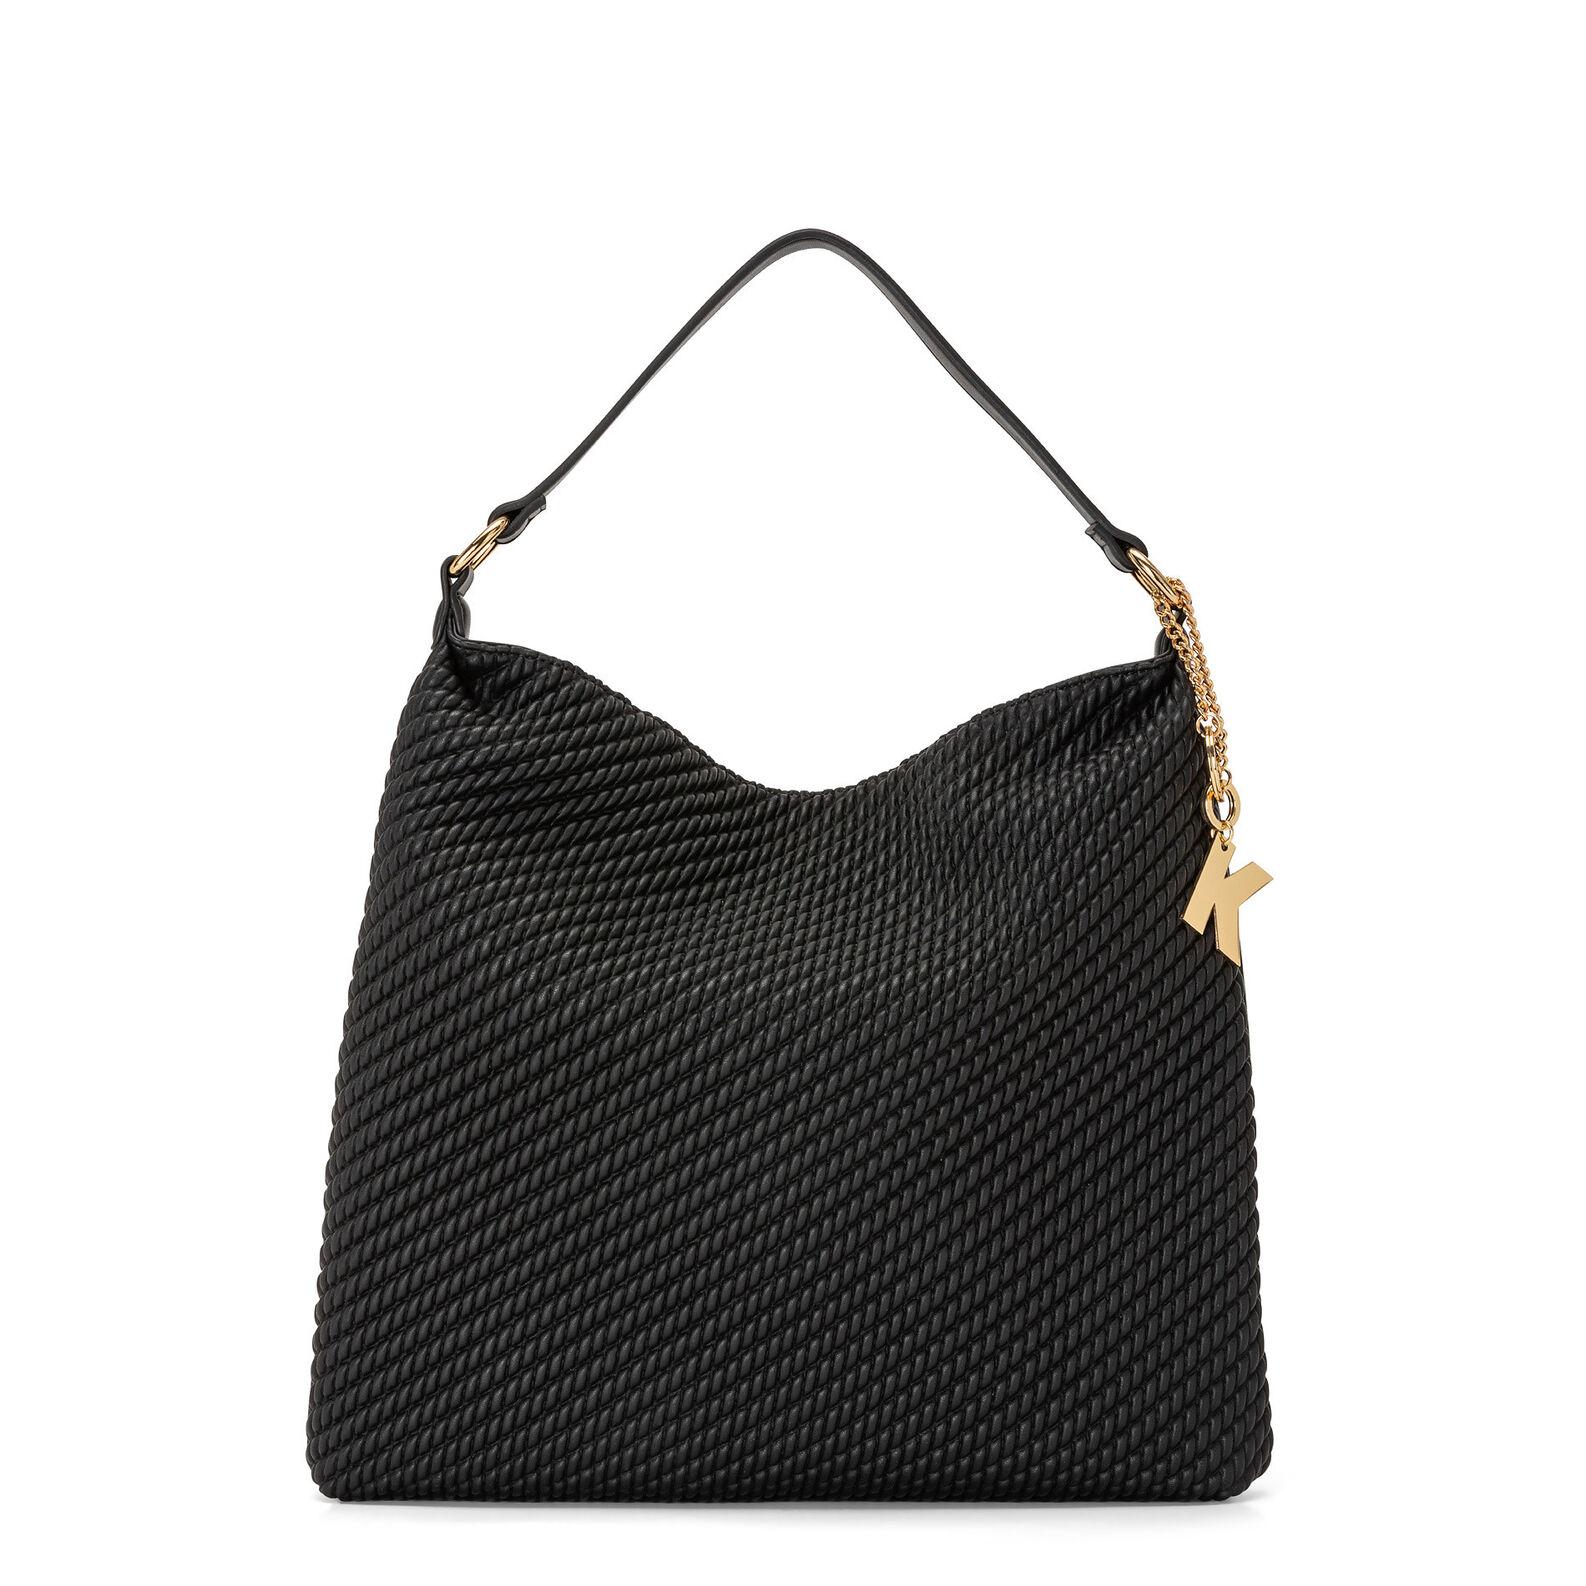 Koan curled-effect bag